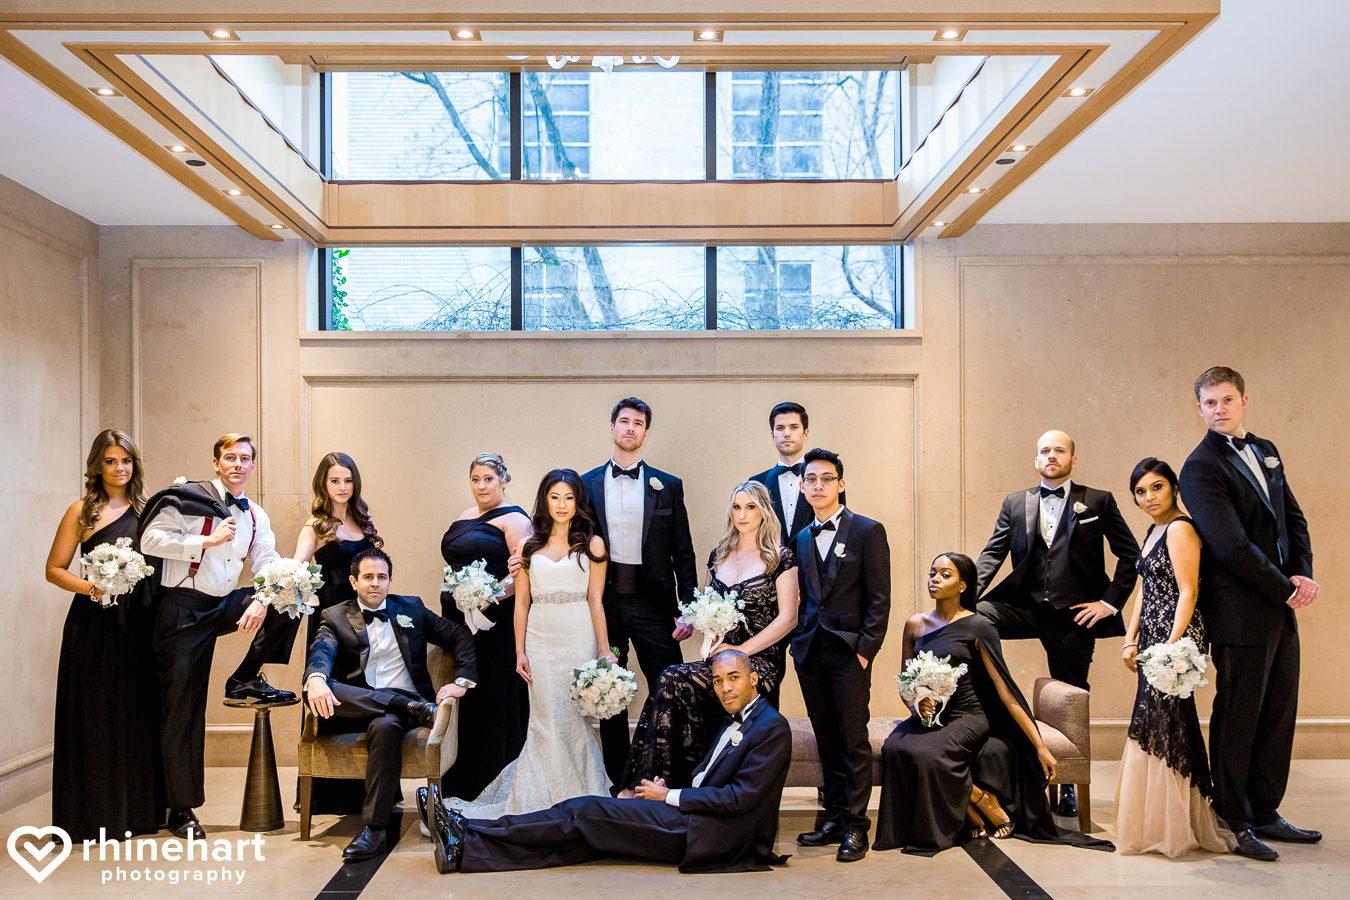 creative-unique-artistic-best-top-colorful-vibrant-emotional-pa-wedding-photographers-2-2